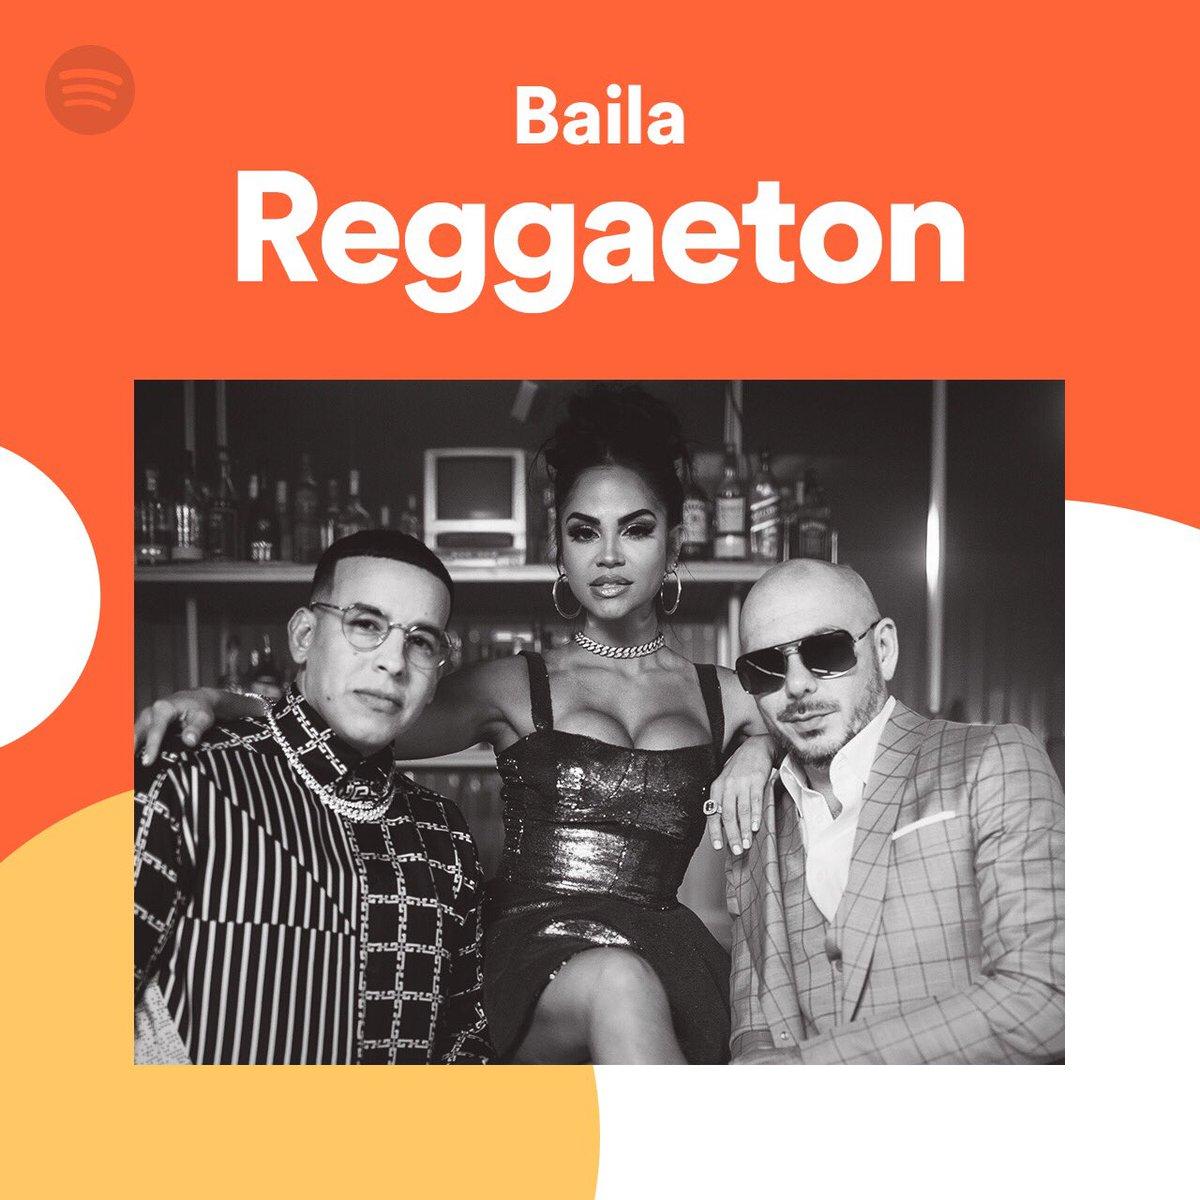 Let's Baila Reggaeton with